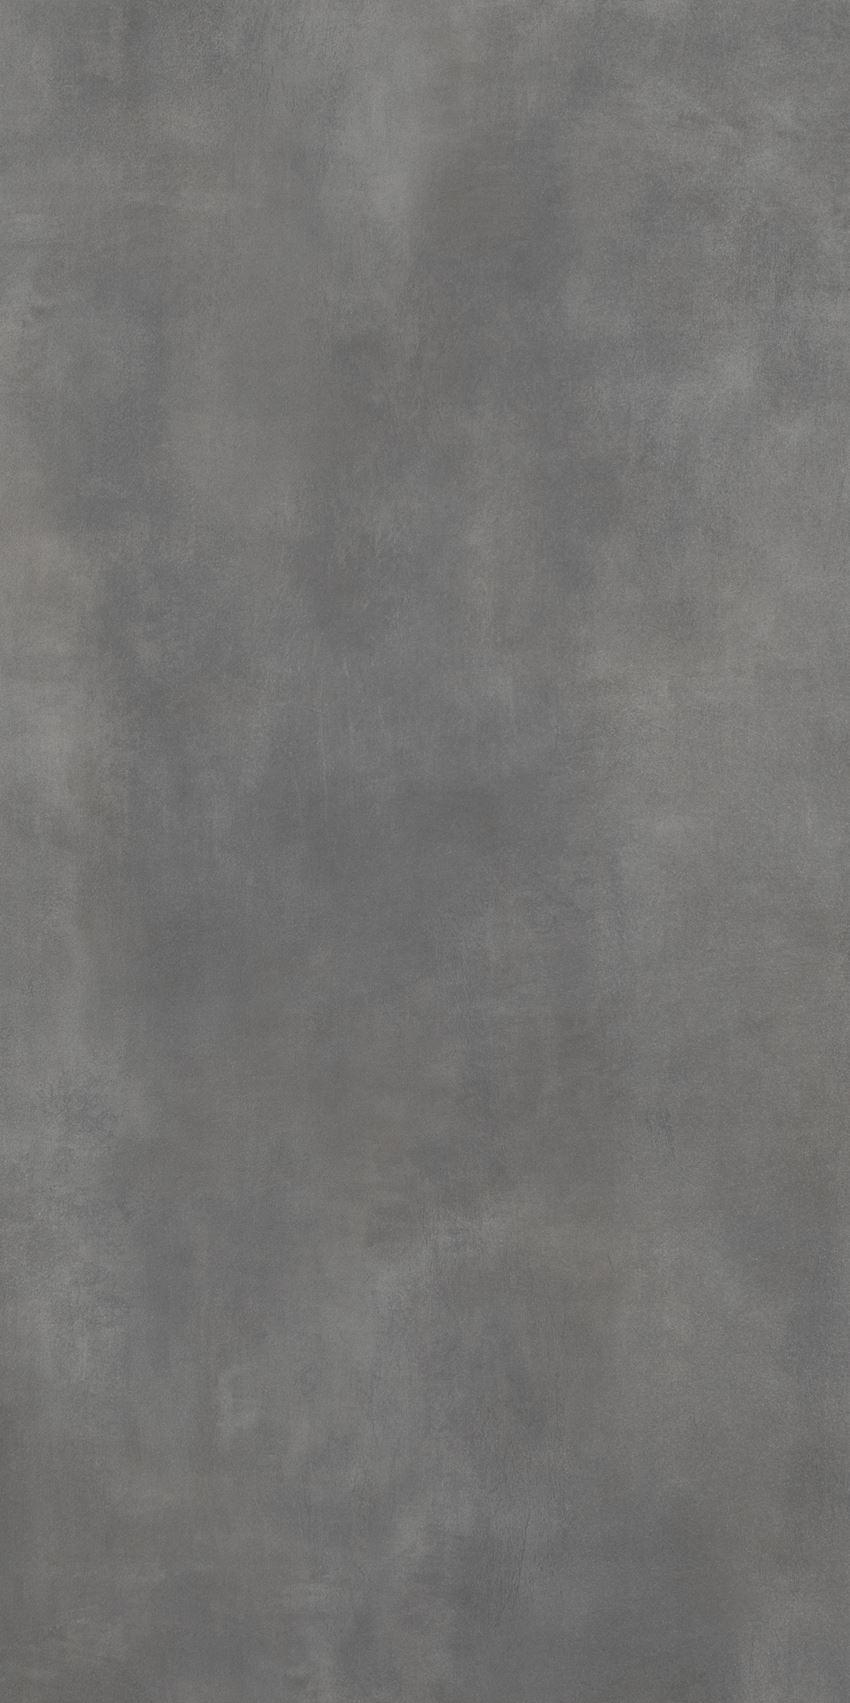 Płytka uniwersalna 44,8x89,8 cm Paradyż Tecniq Grafit Gres Szkl. Rekt. Półpoler